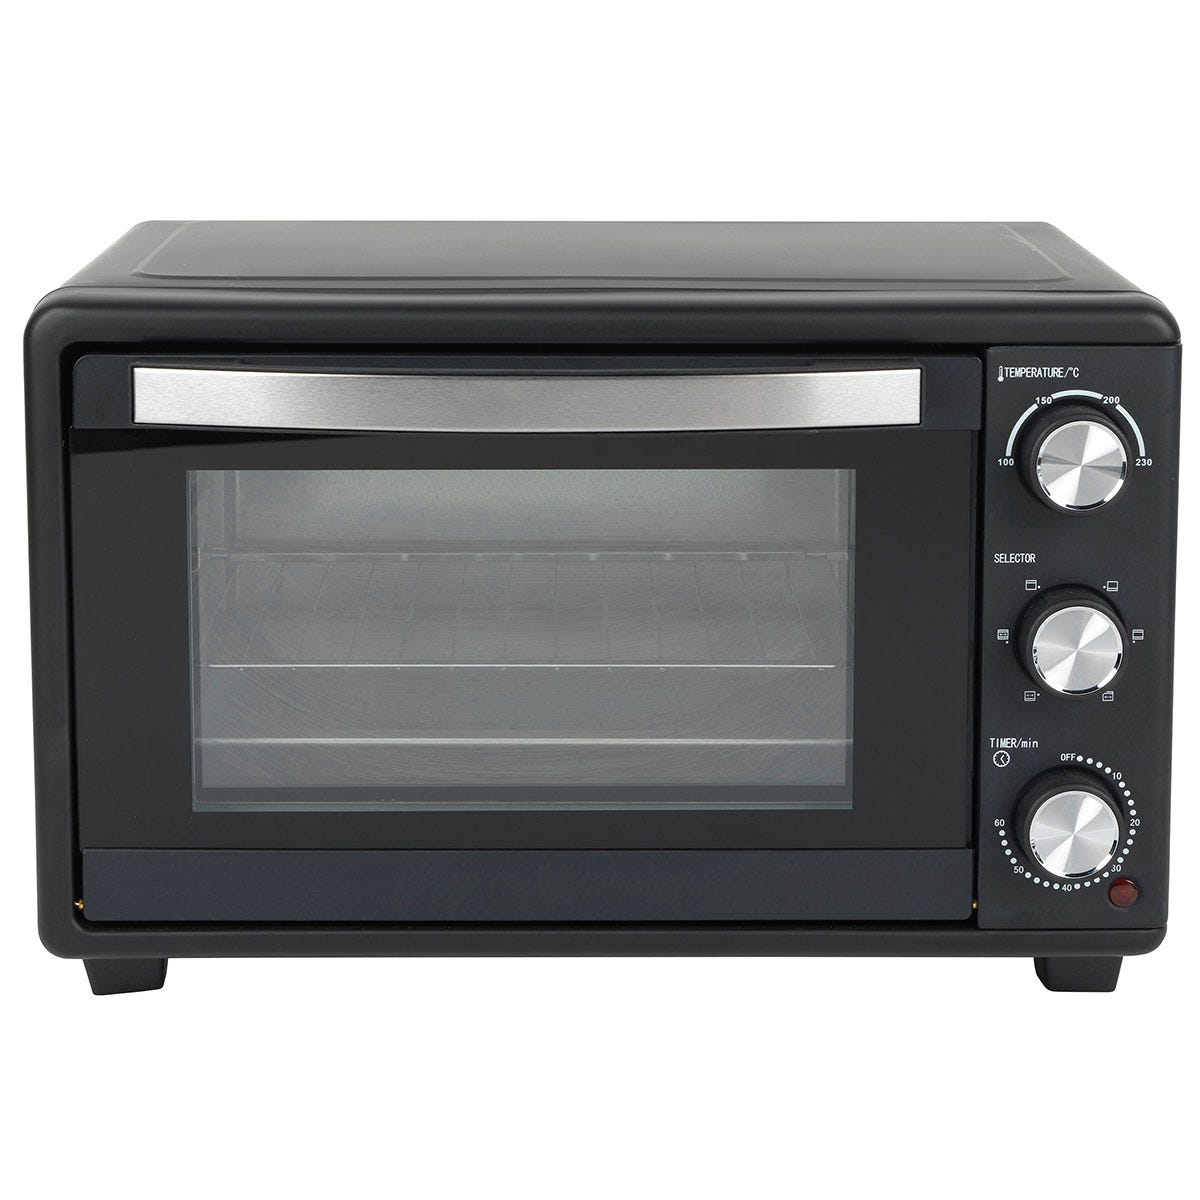 Salter EK4360 25L Mini Oven - Black